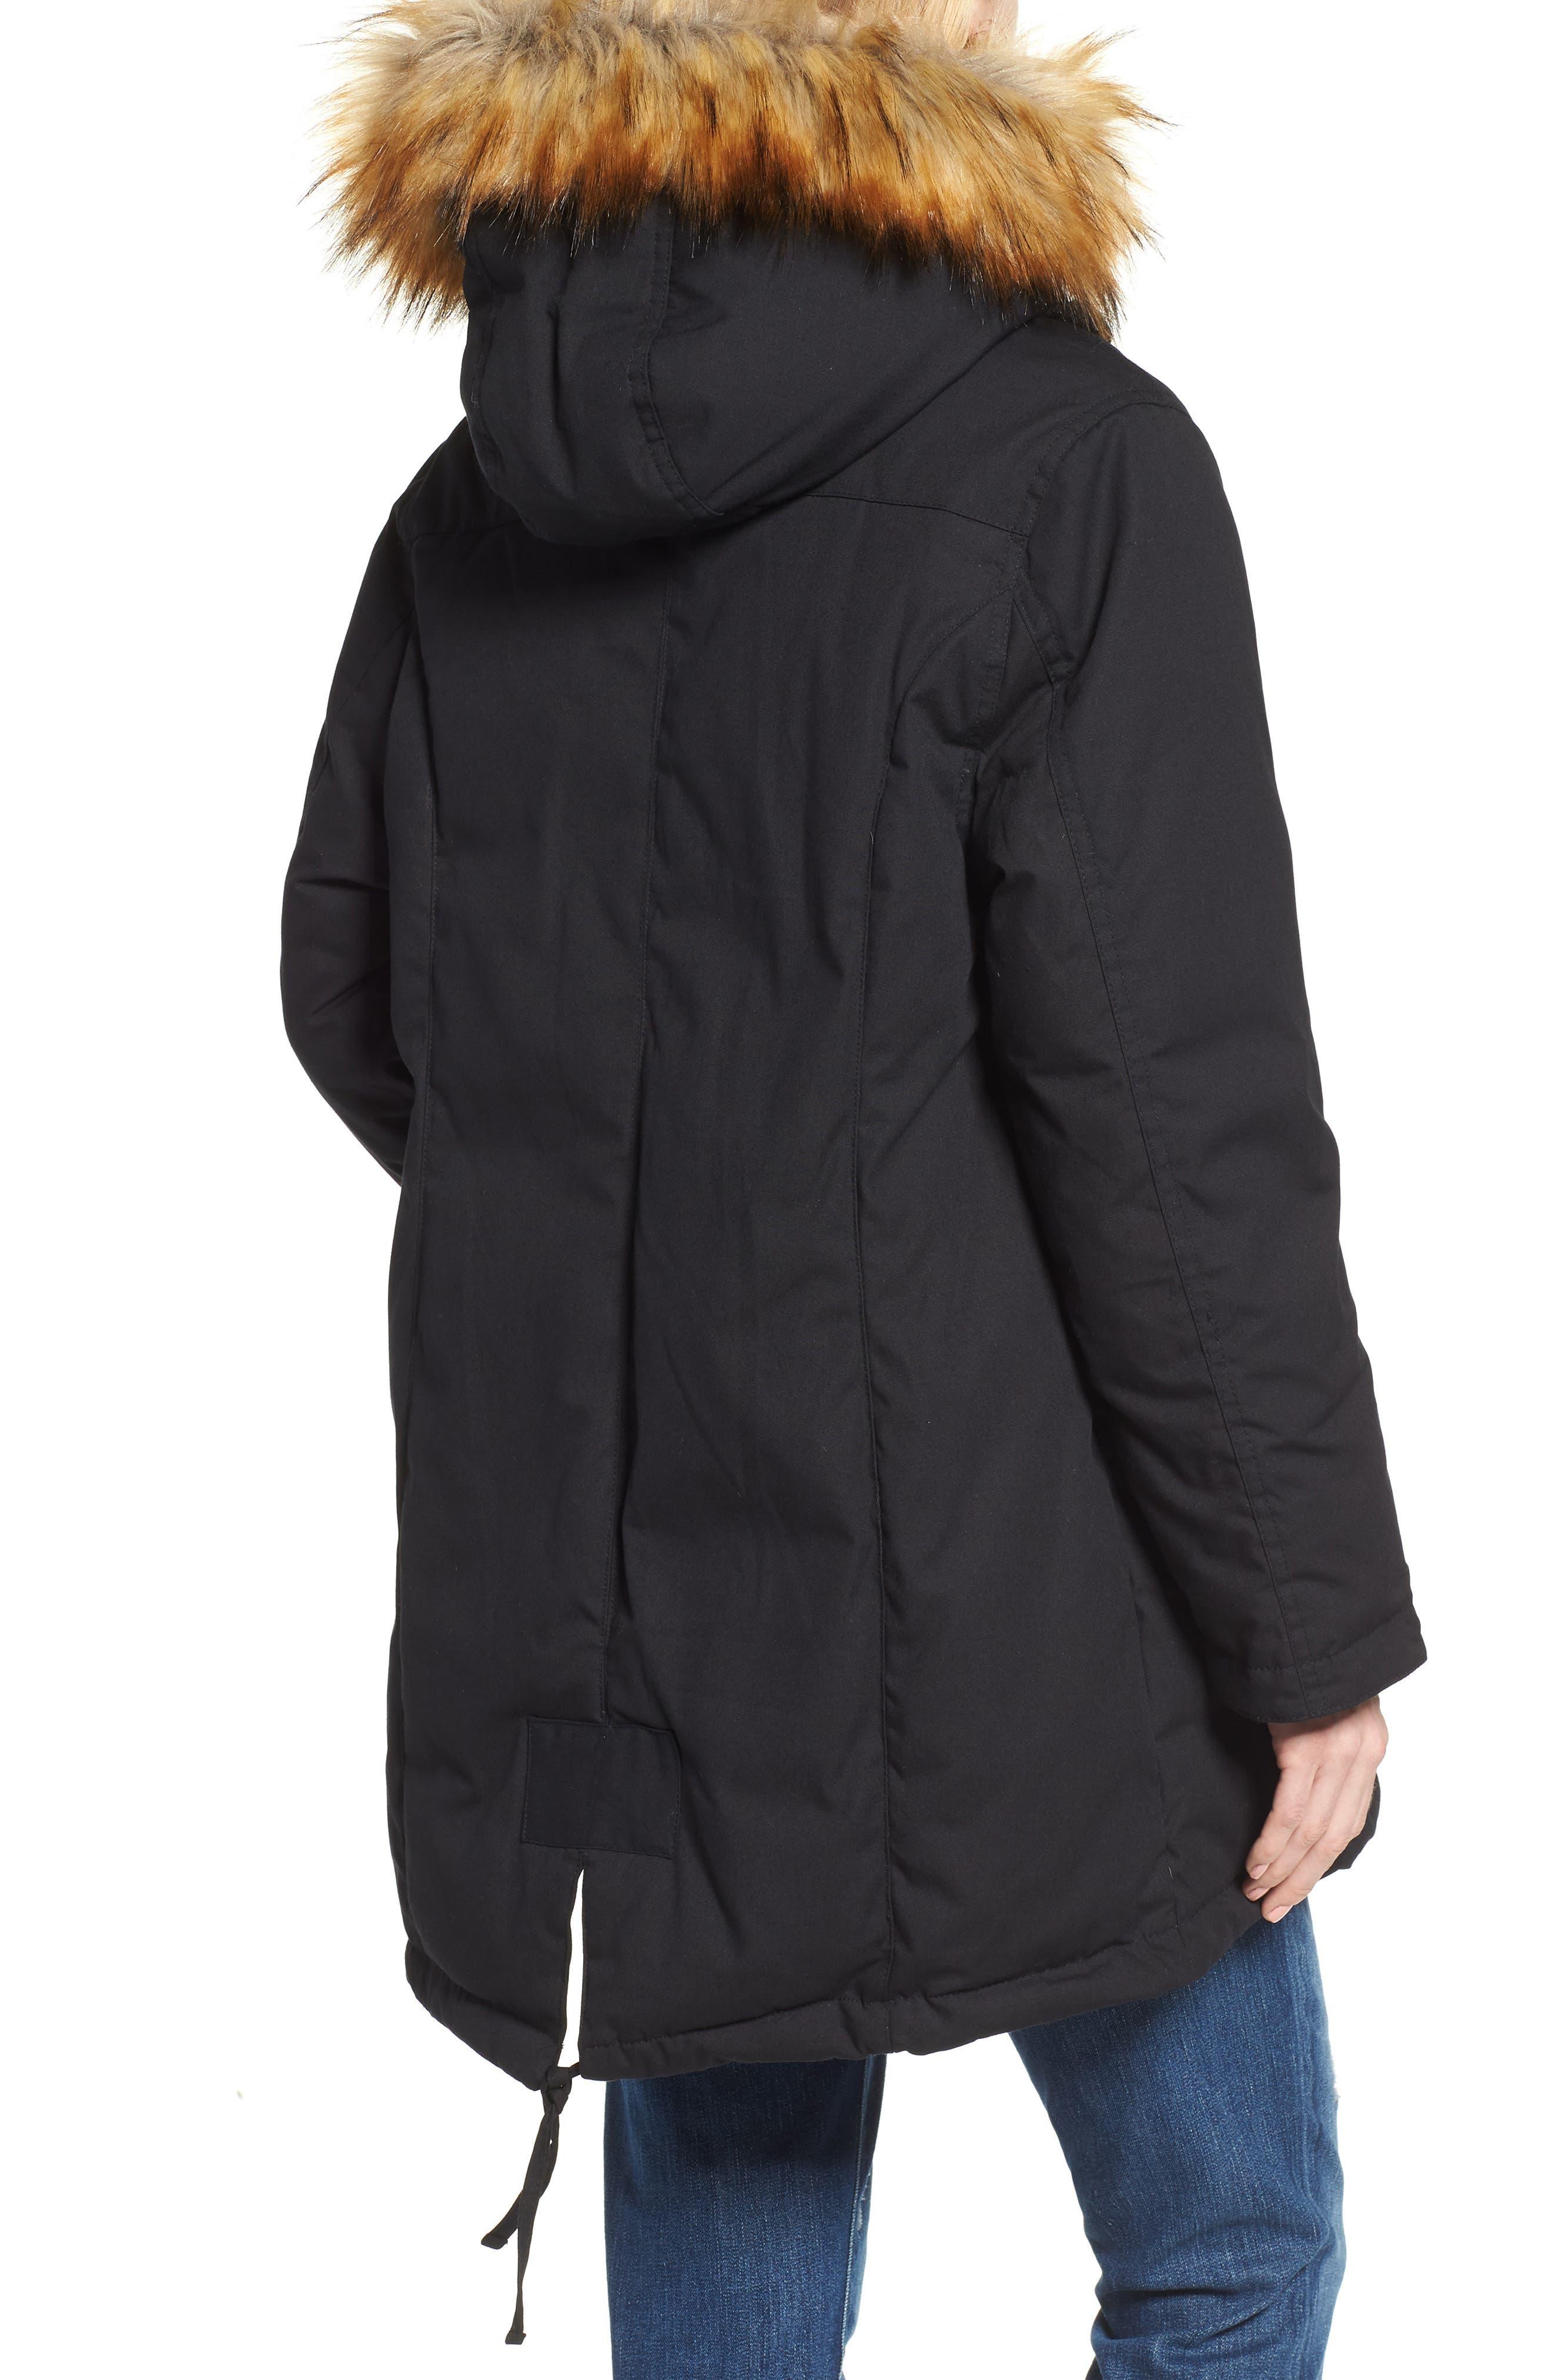 MODERN ETERNITY, Convertible Down 3-in-1 Maternity Jacket, Alternate thumbnail 3, color, BLACK